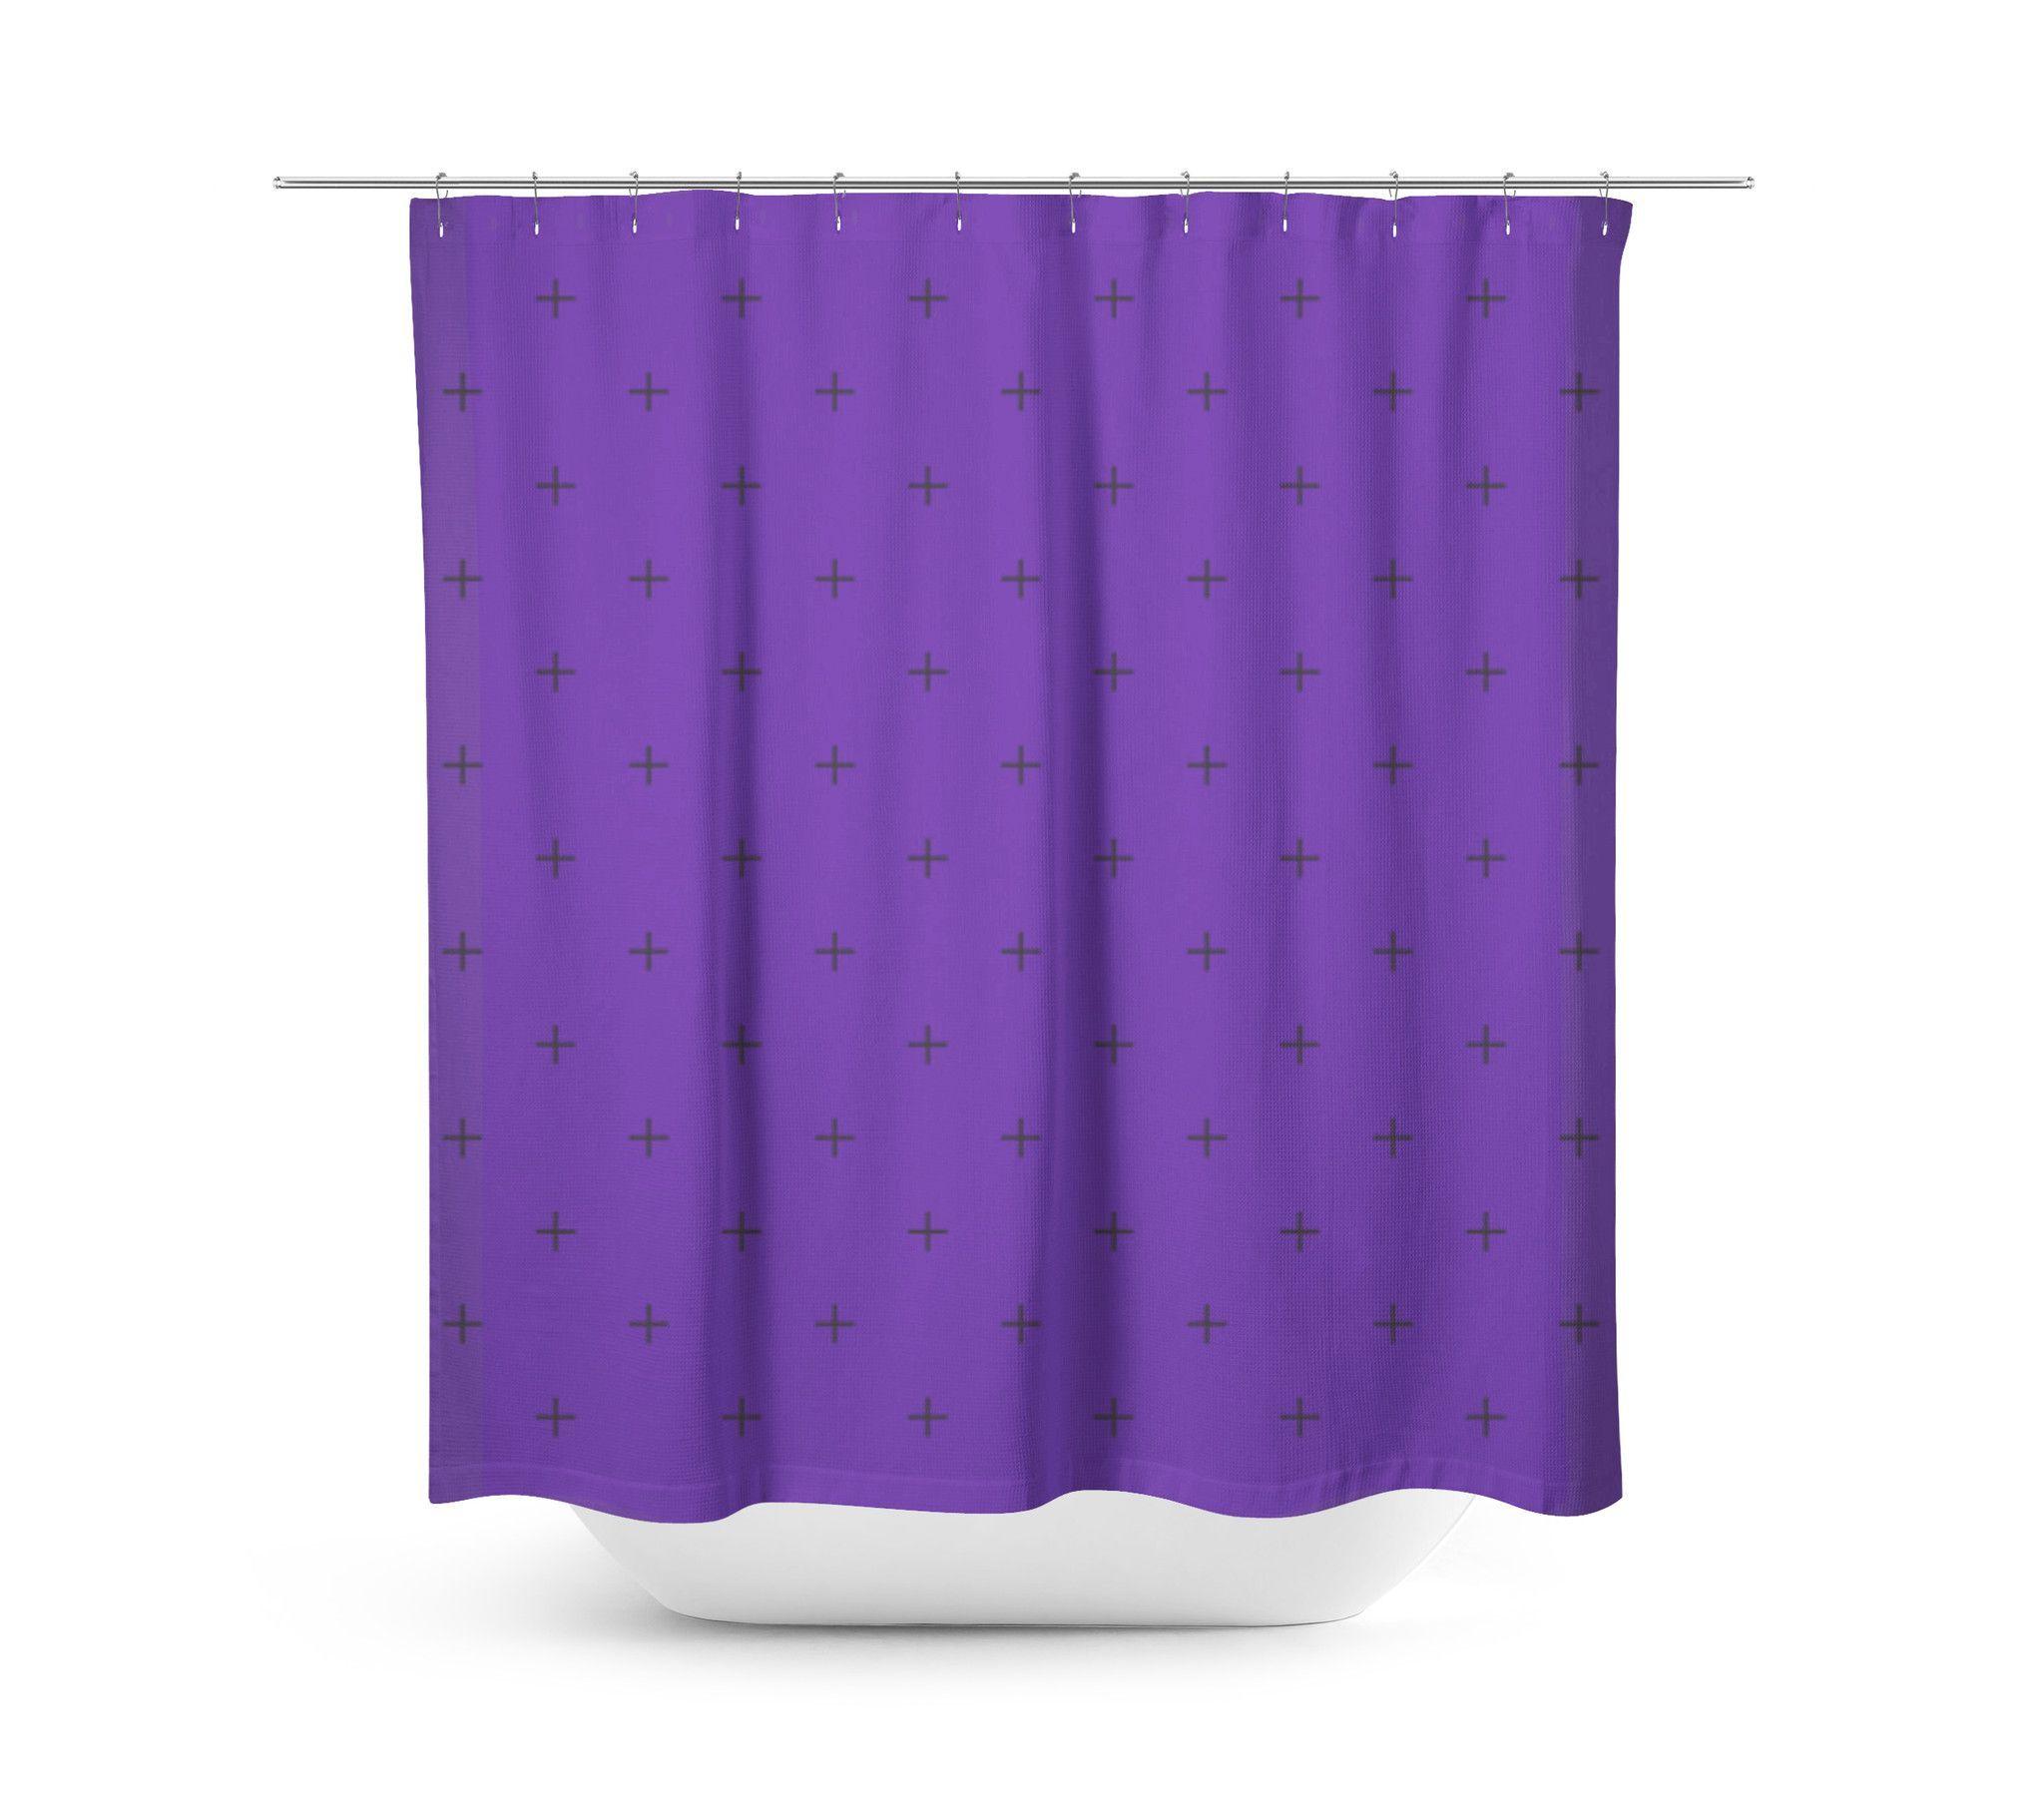 Swiss Cross Dark Purple Shower Curtain Navy Blue Shower Curtain